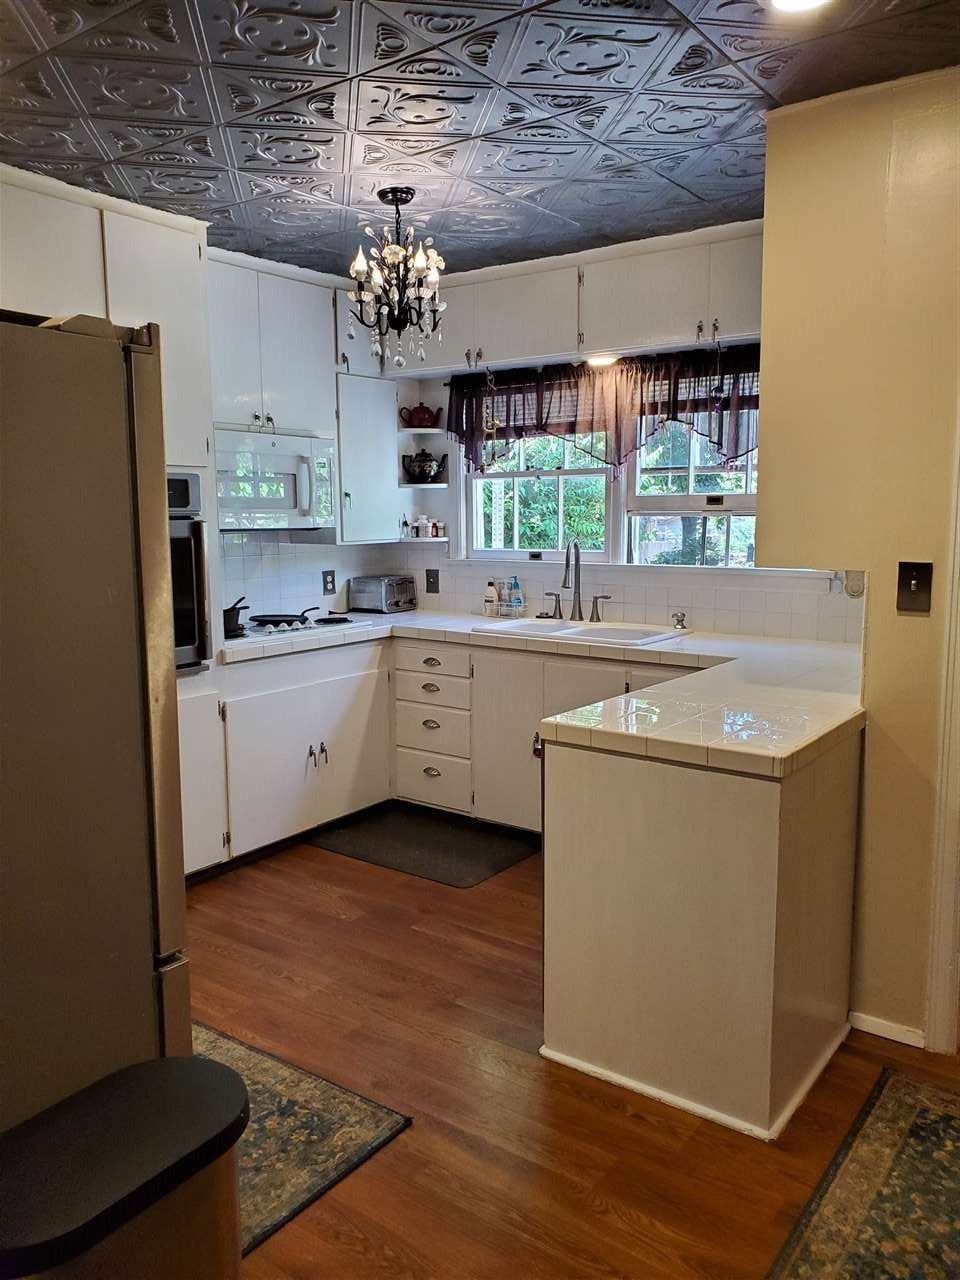 #century21groupone,#homesforsaleponcacity,#poncacityrealestate | 1106 S 7th Street  Ponca City, OK 74601-0 15